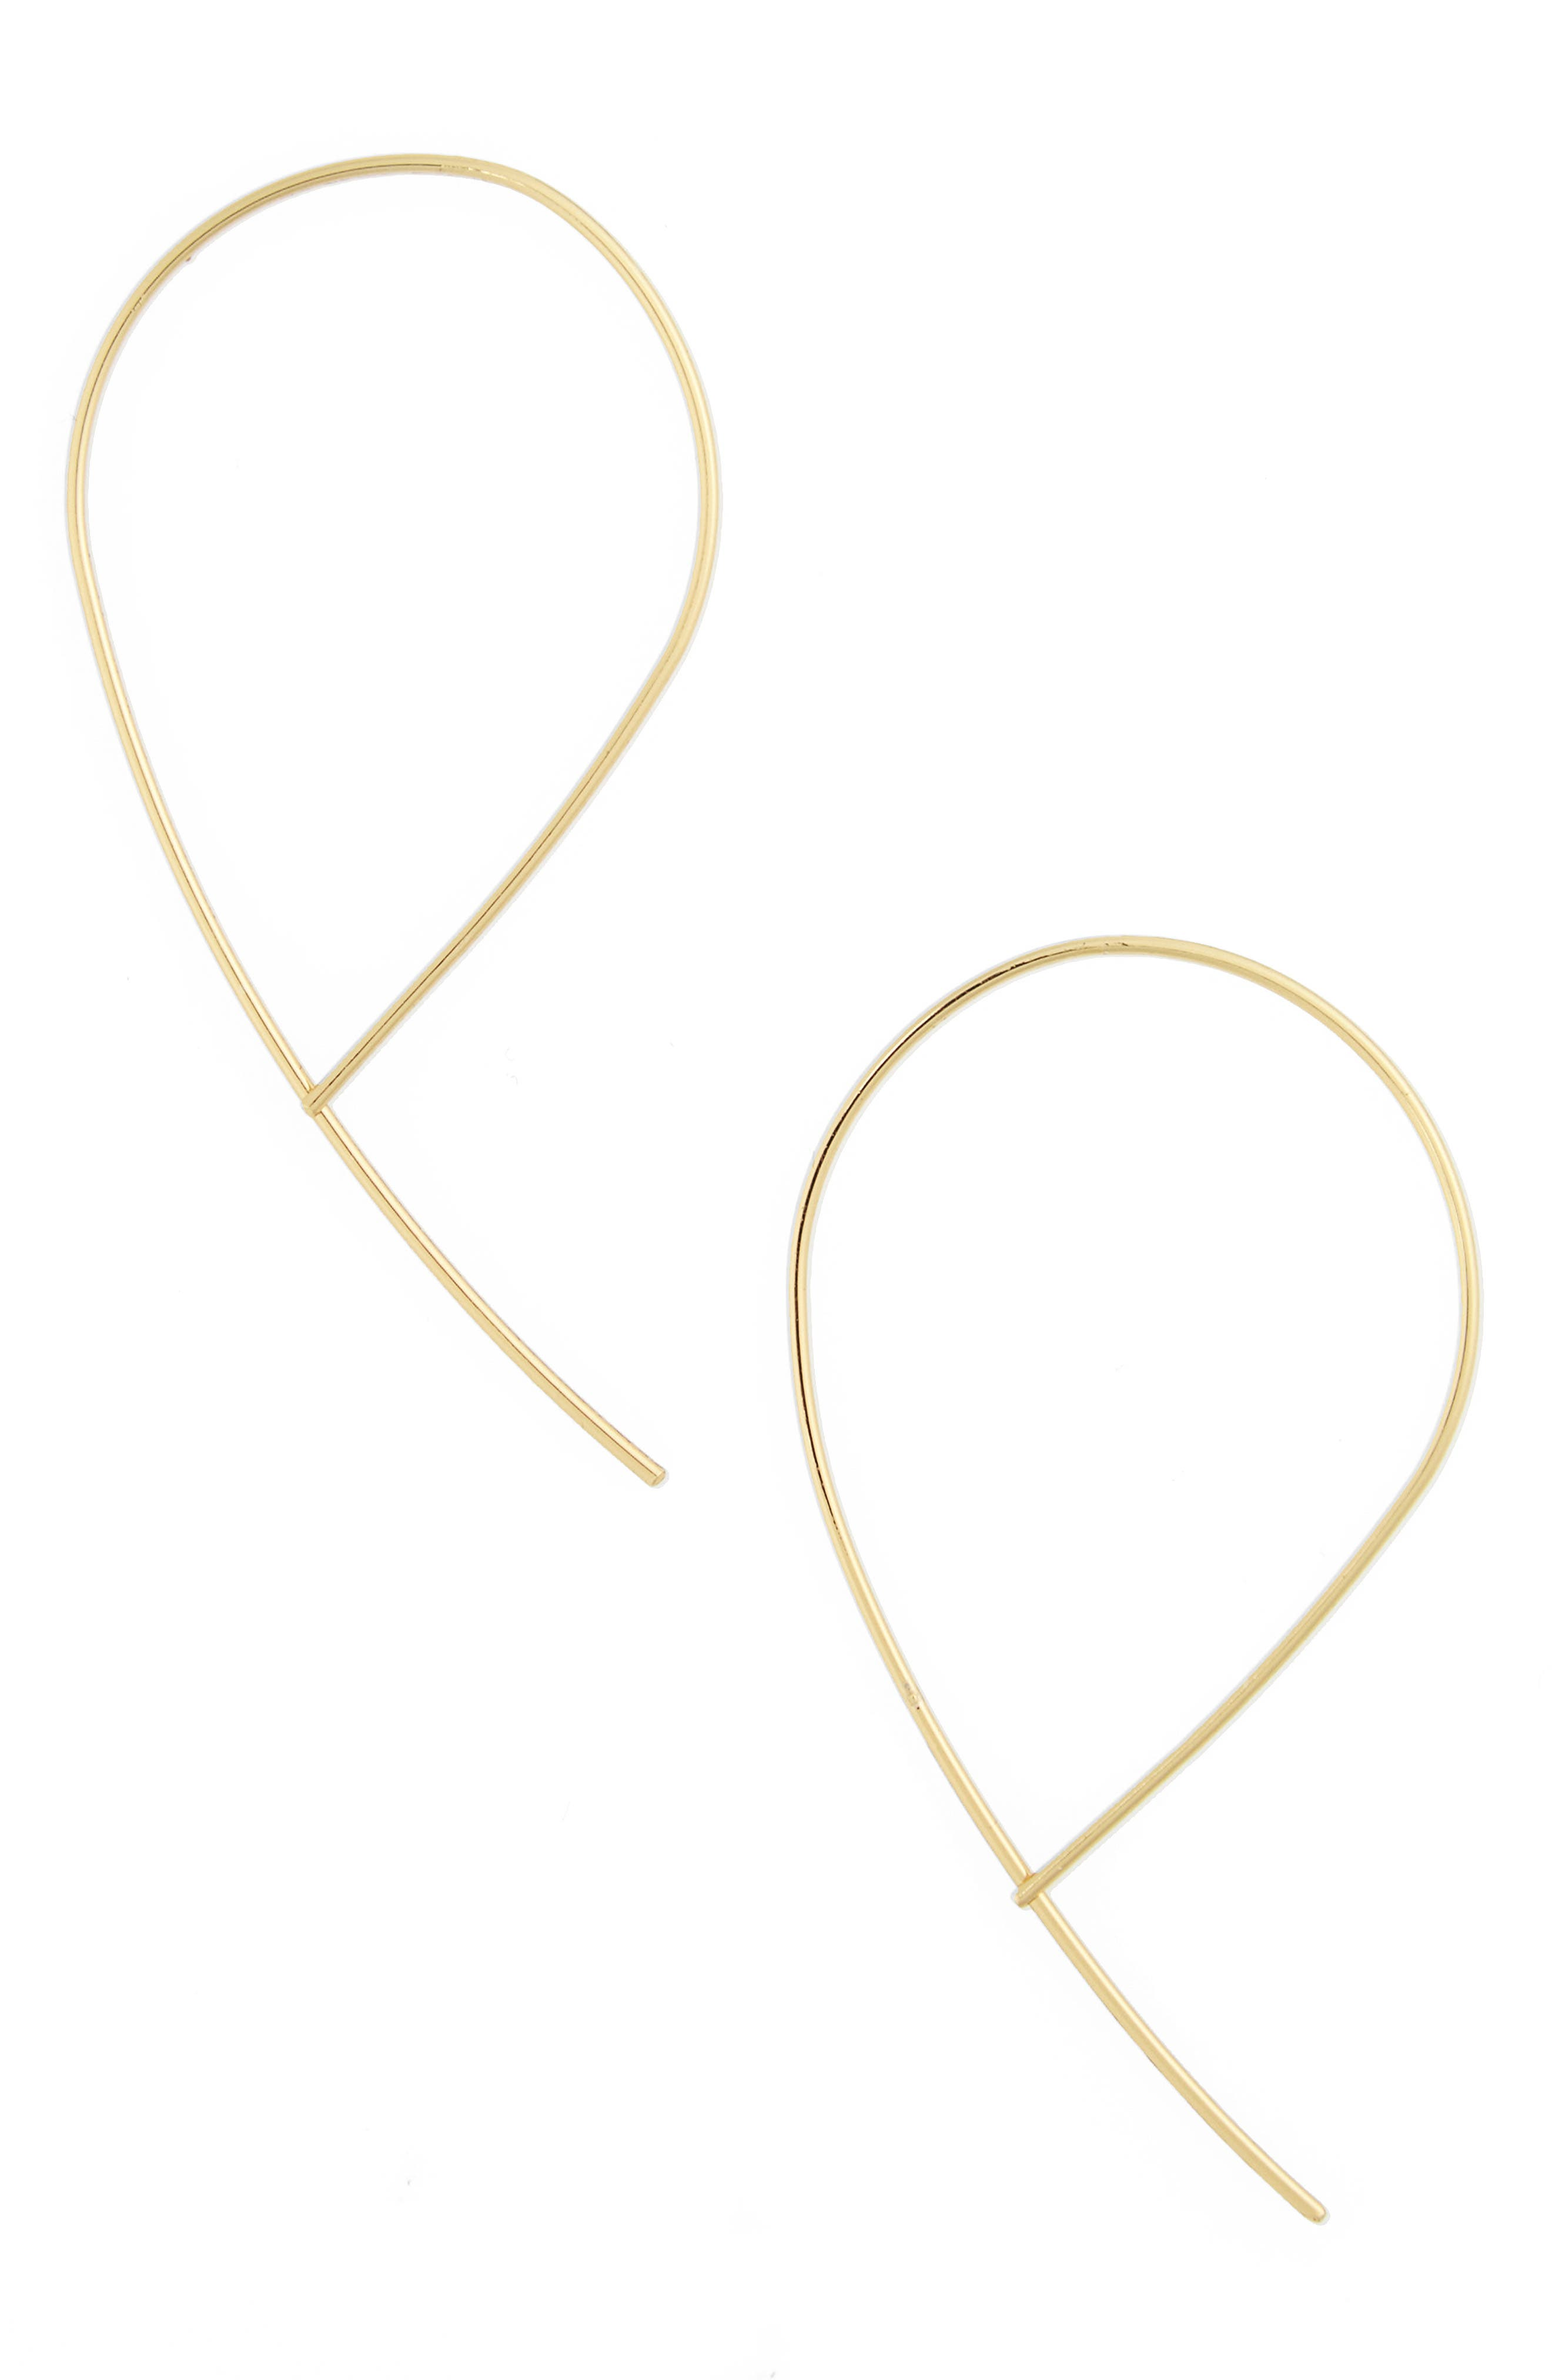 BAUBLEBAR Arie Threader Earrings, Main, color, GOLD